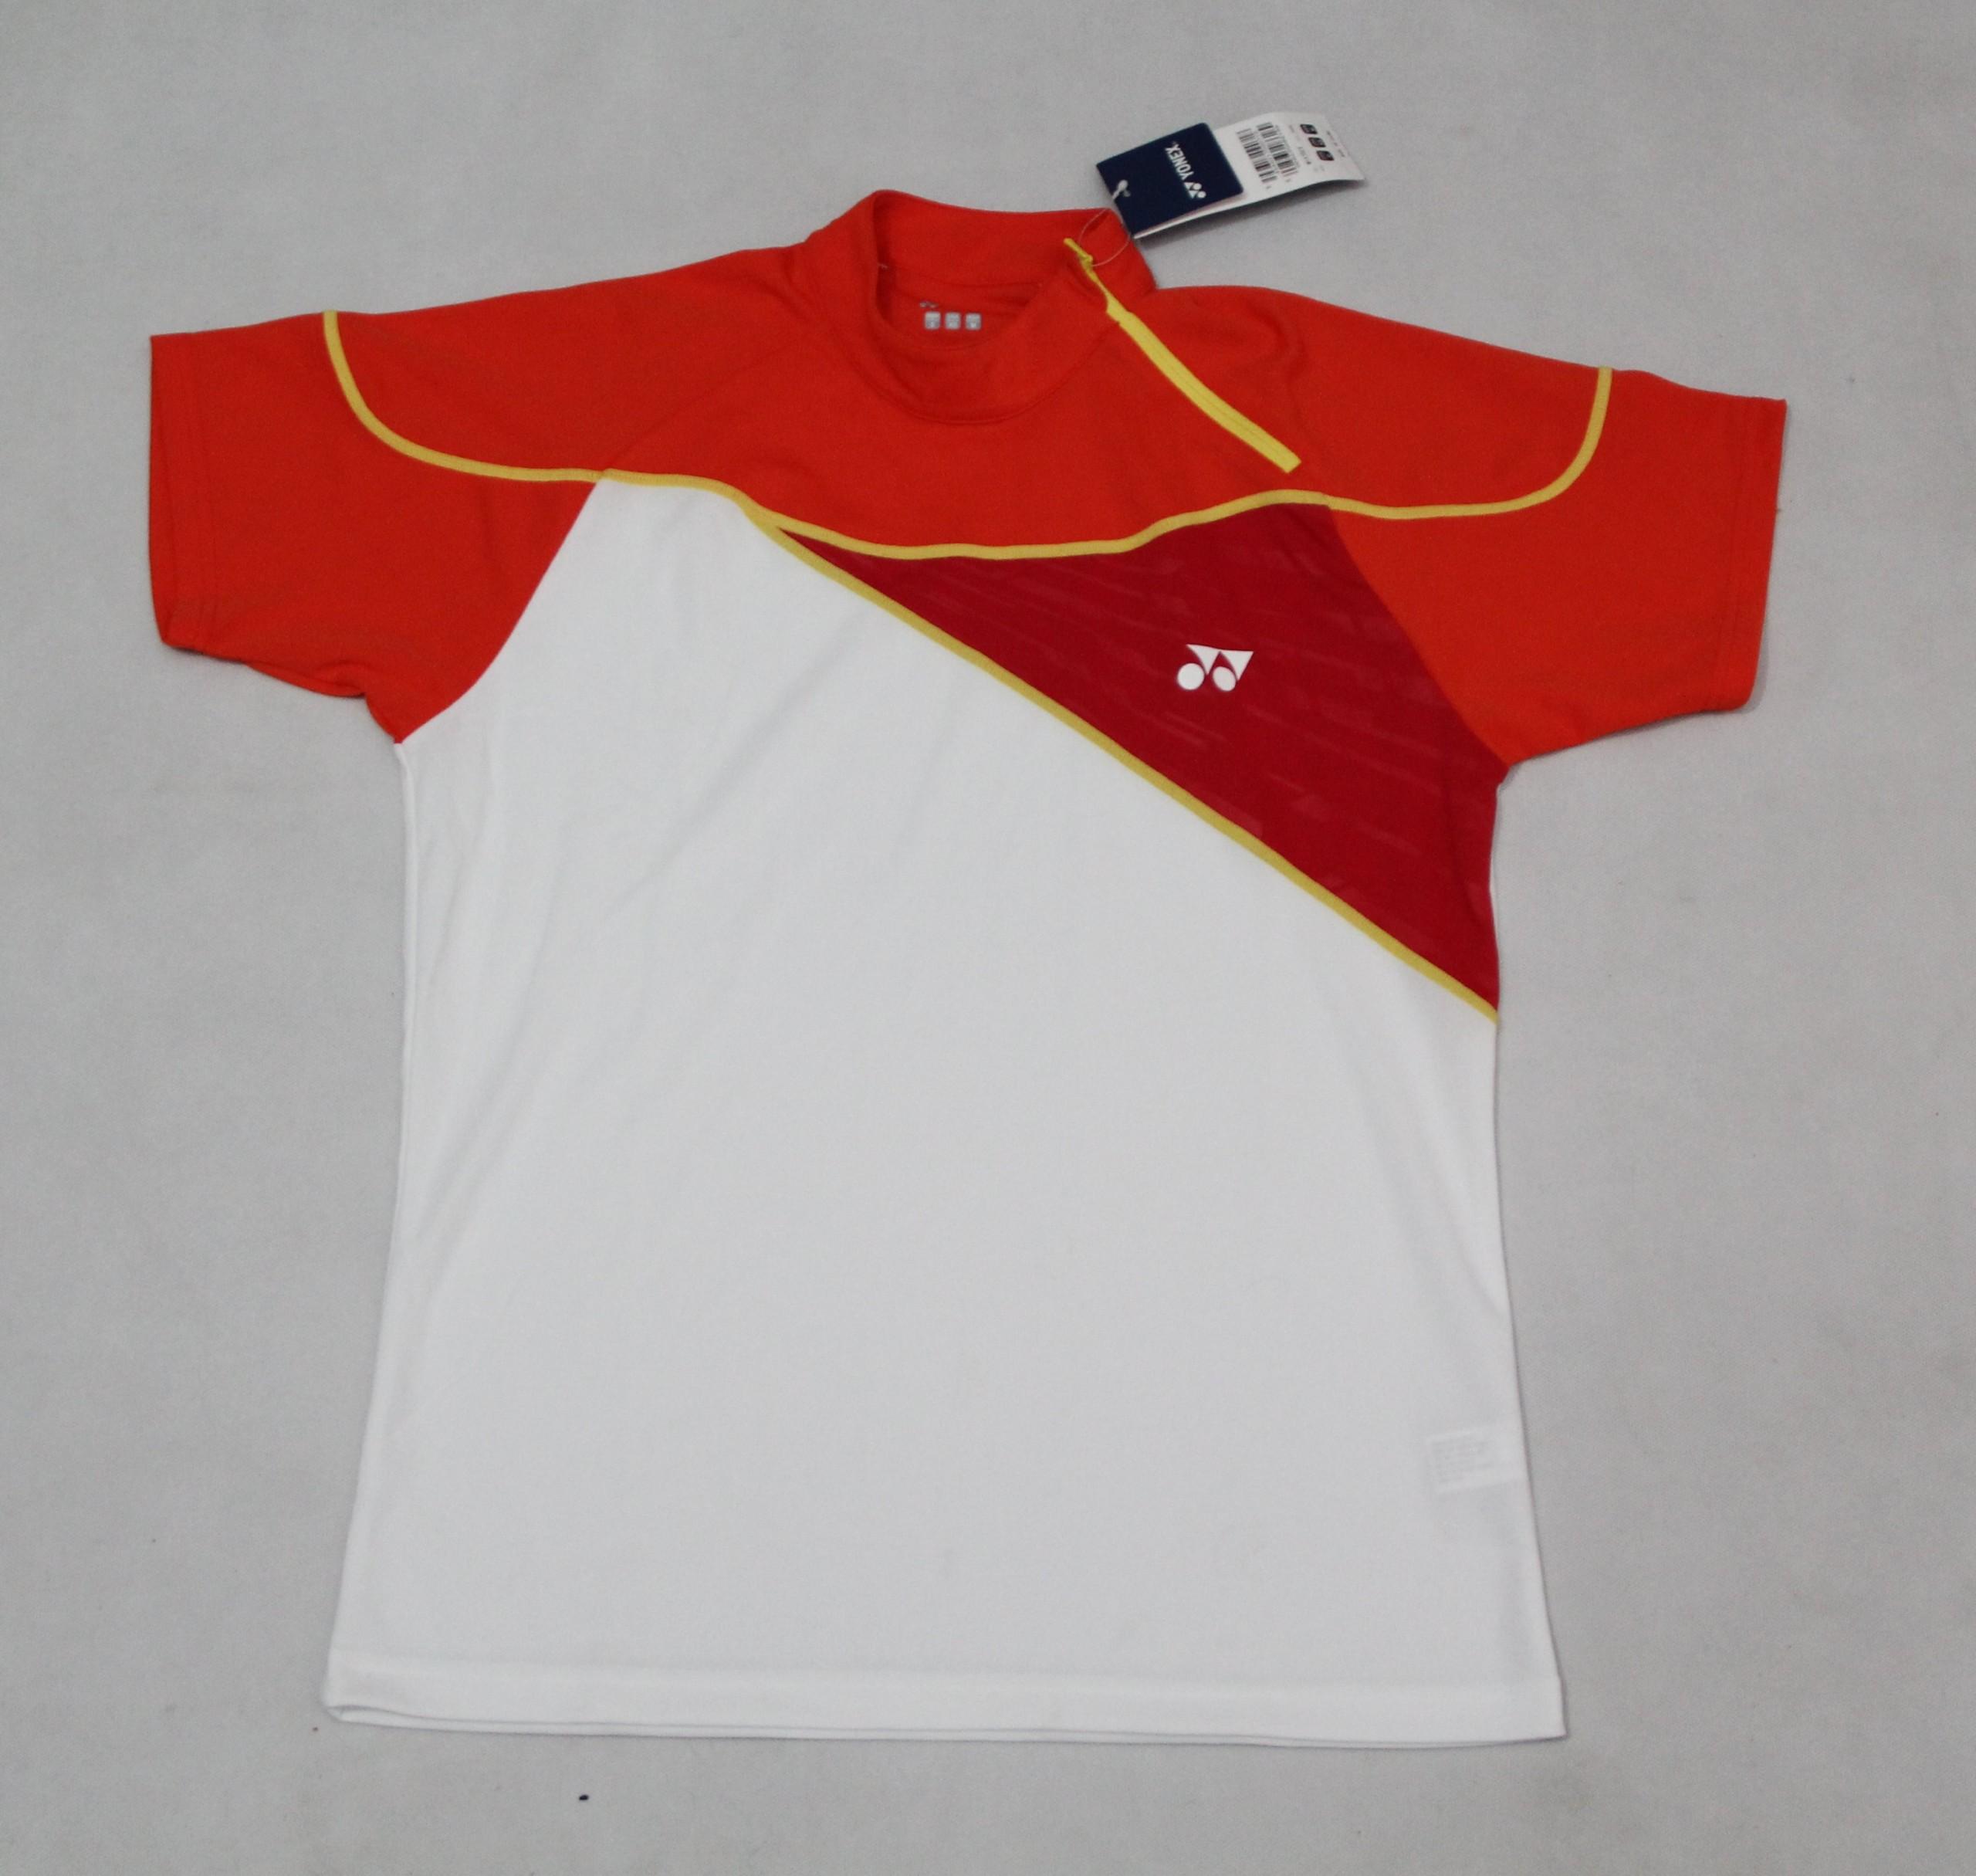 63fdbd0fa6483c Yonex Koszulka Men'S Polo Shirt - Orange (M1475Ex) - 7702533224 ...